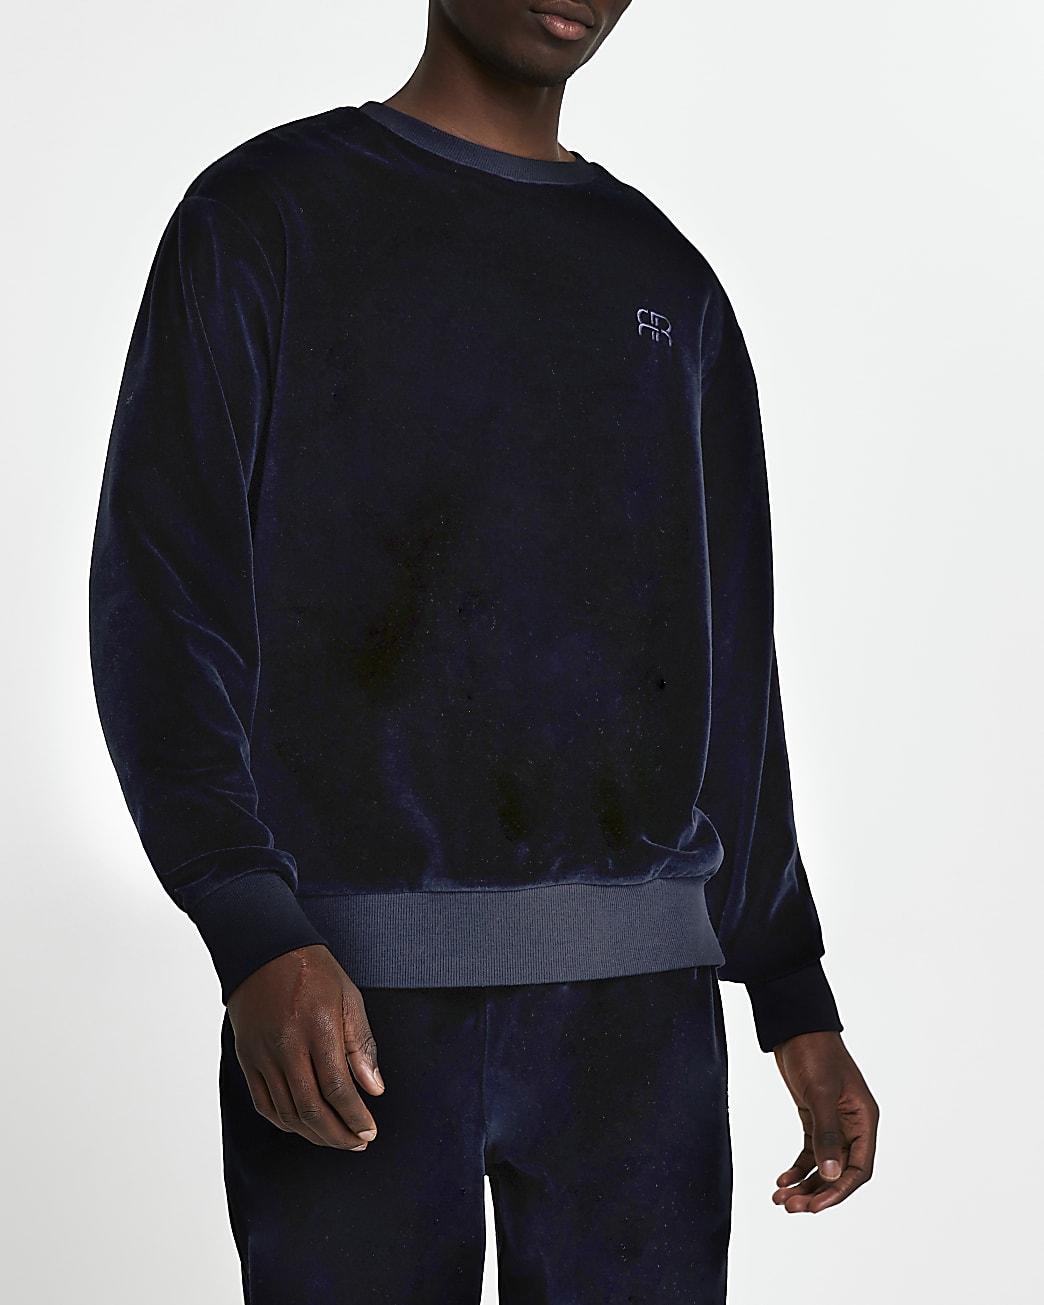 Navy velour 'RR' crew sweatshirt